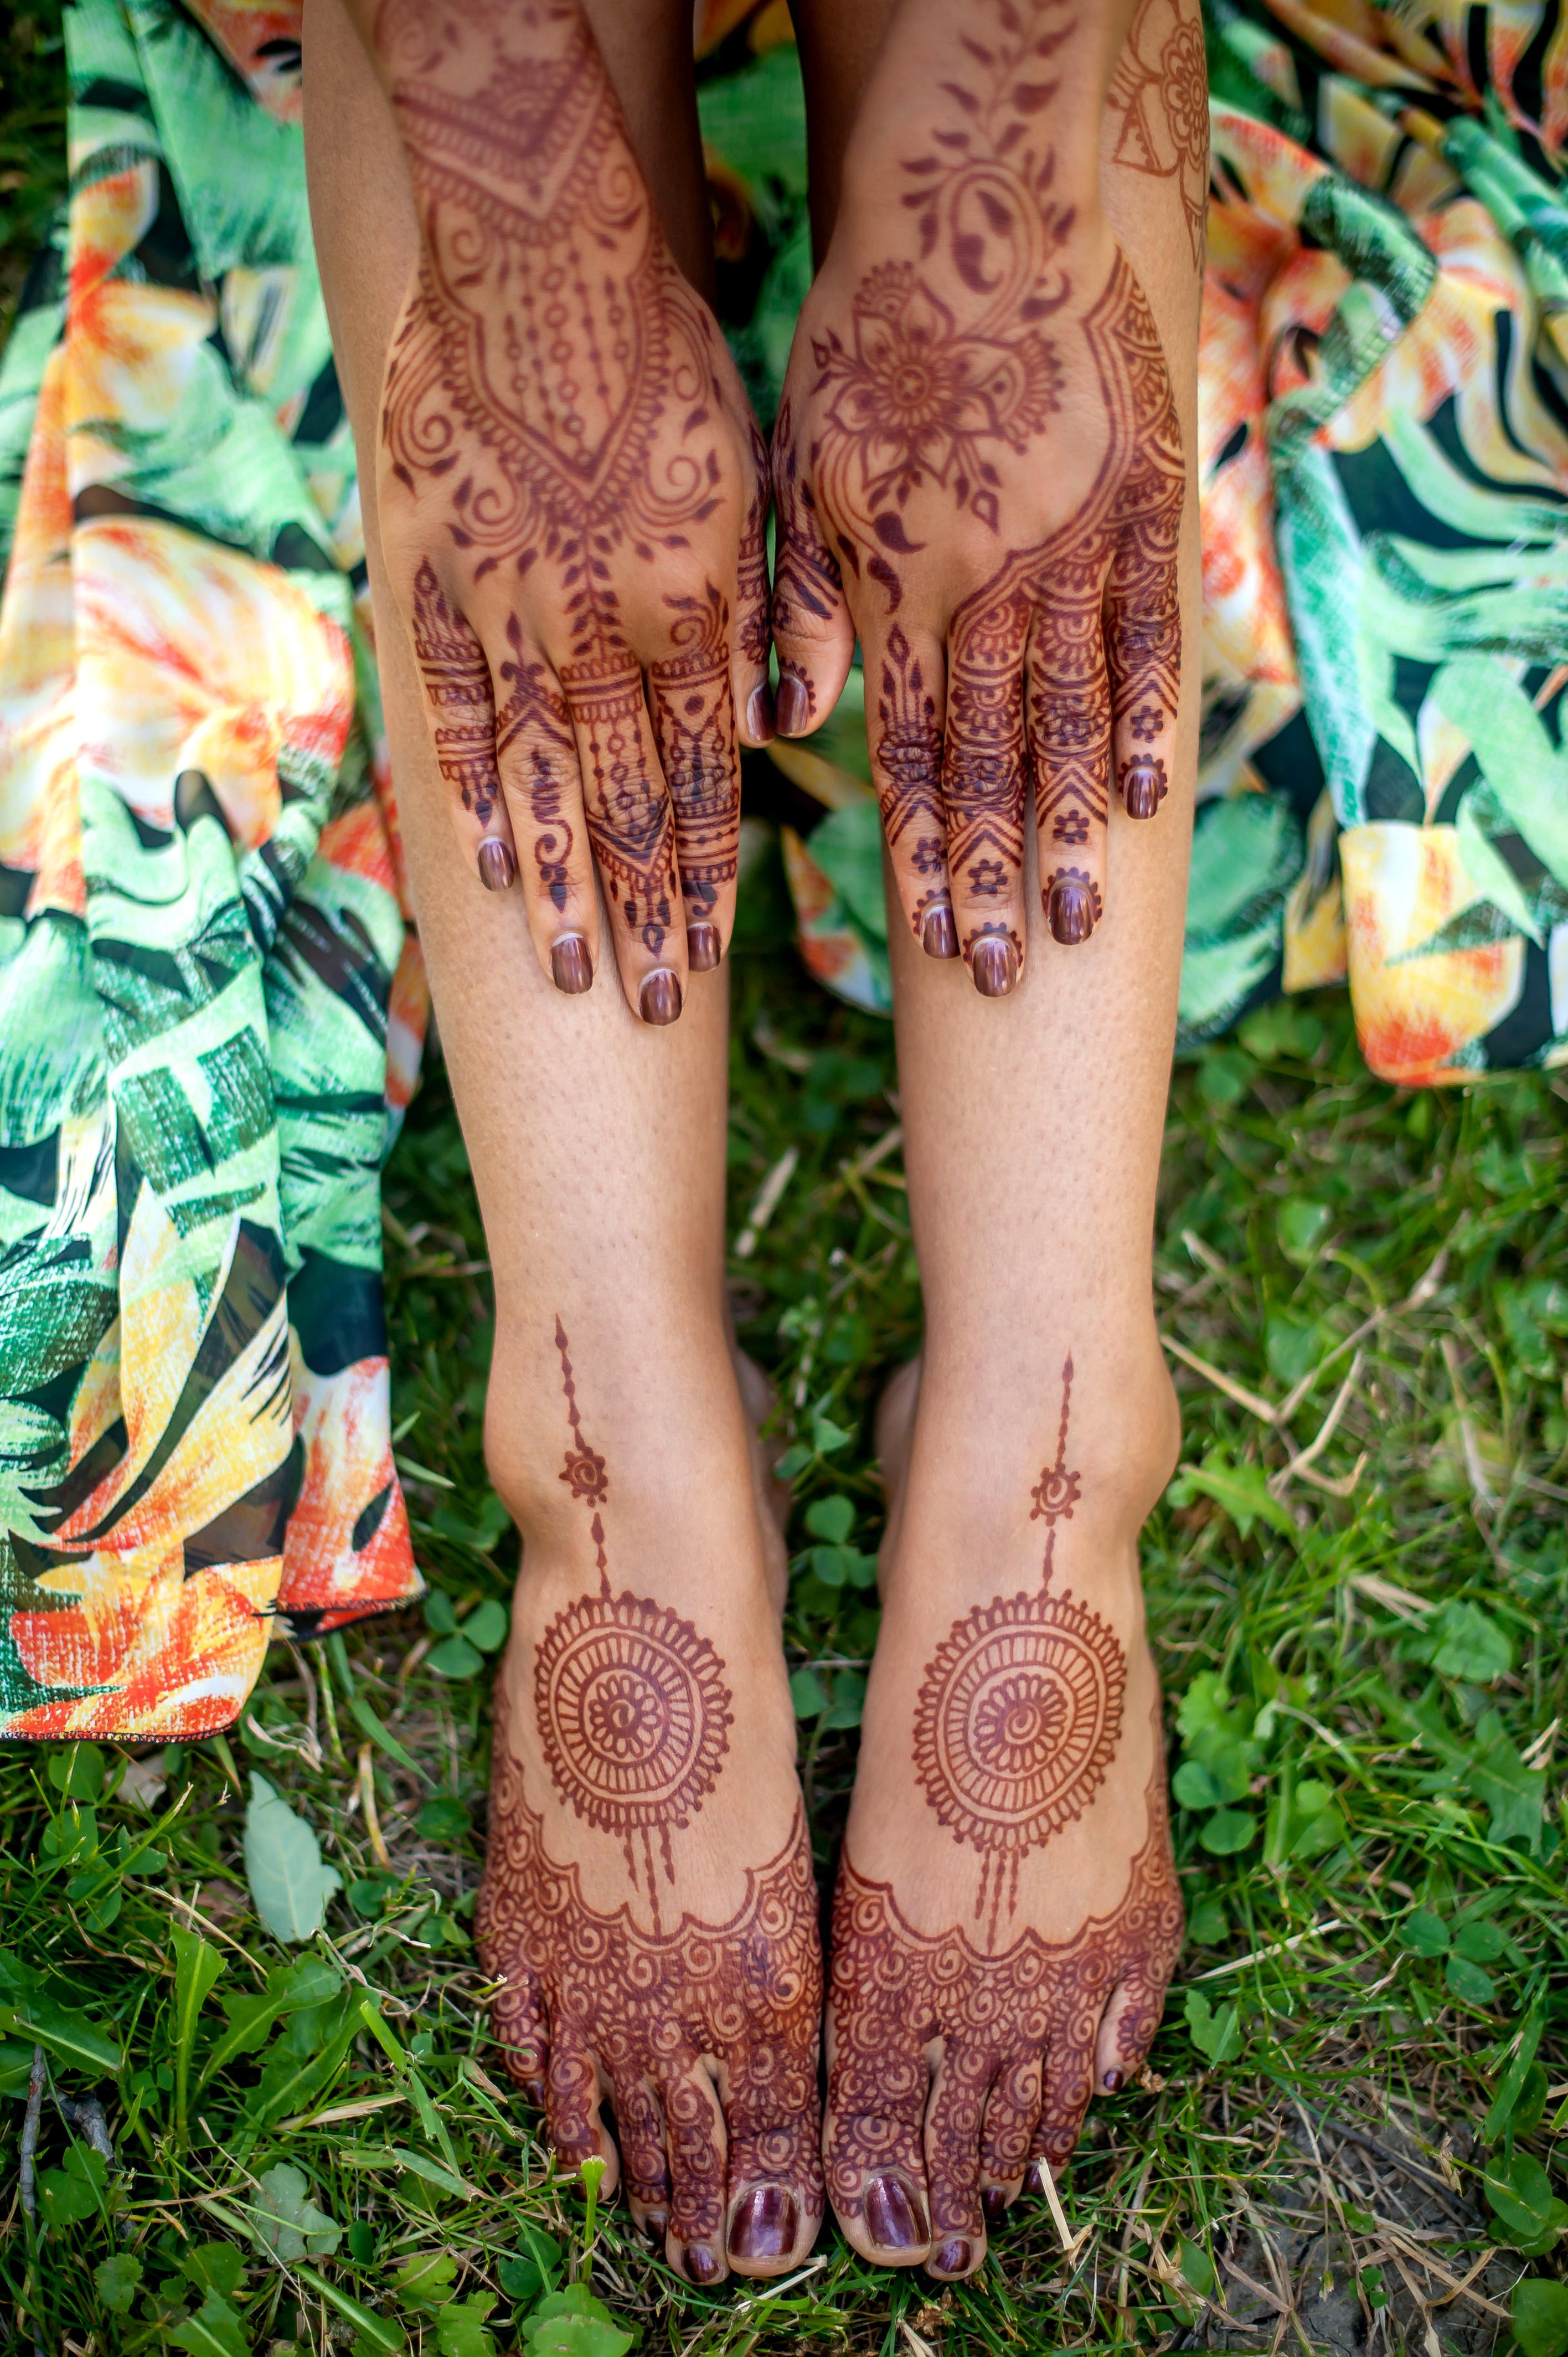 Khadija S Henna Body Art Recipe Henna Blog Spot